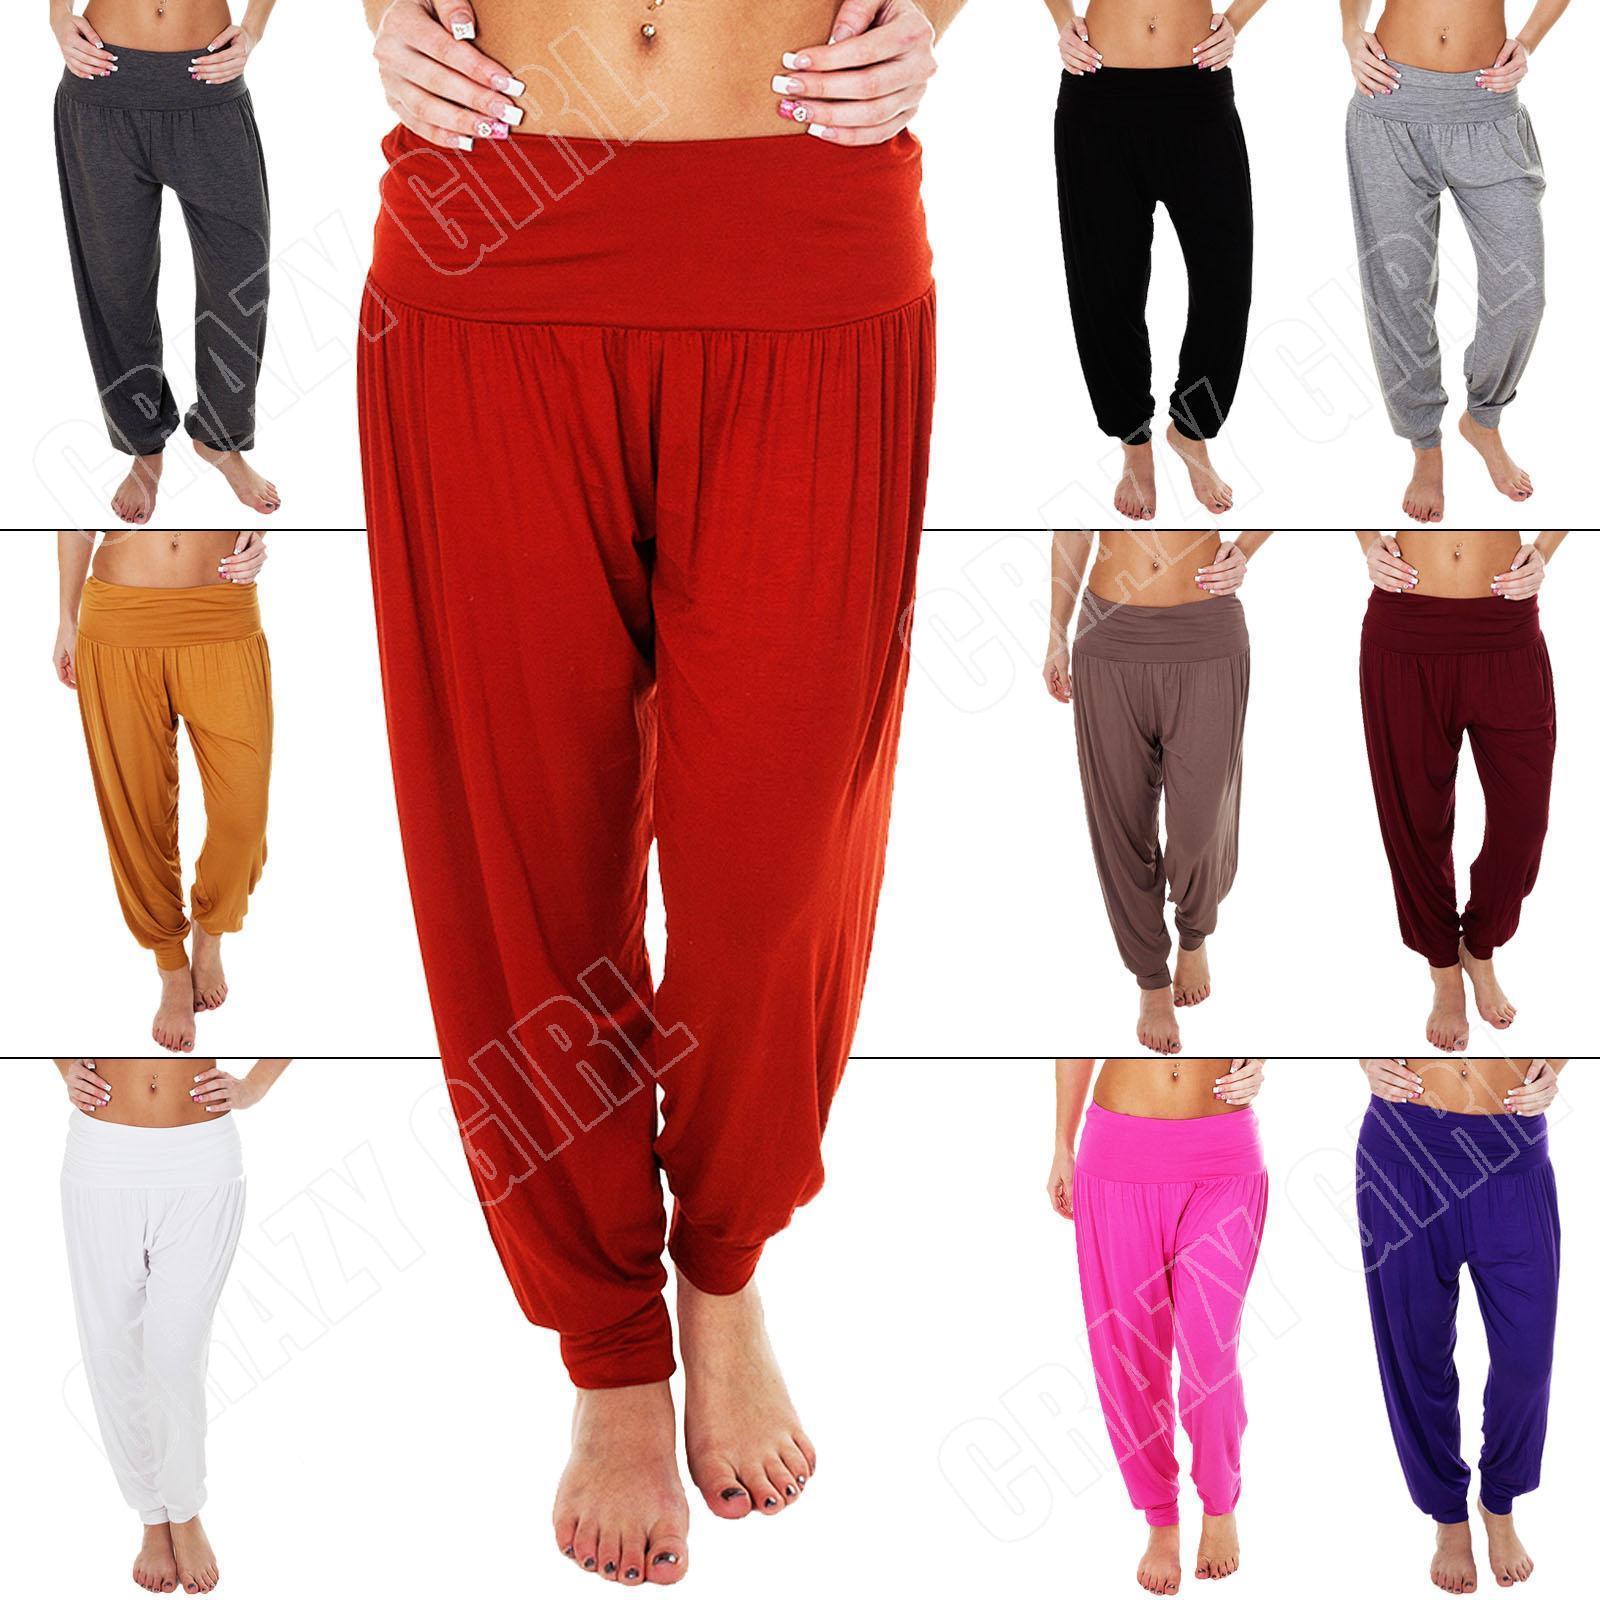 New Ladies Womens Ali Baba Hareem Pants Harem Plain Trousers Plus Size S M L XL